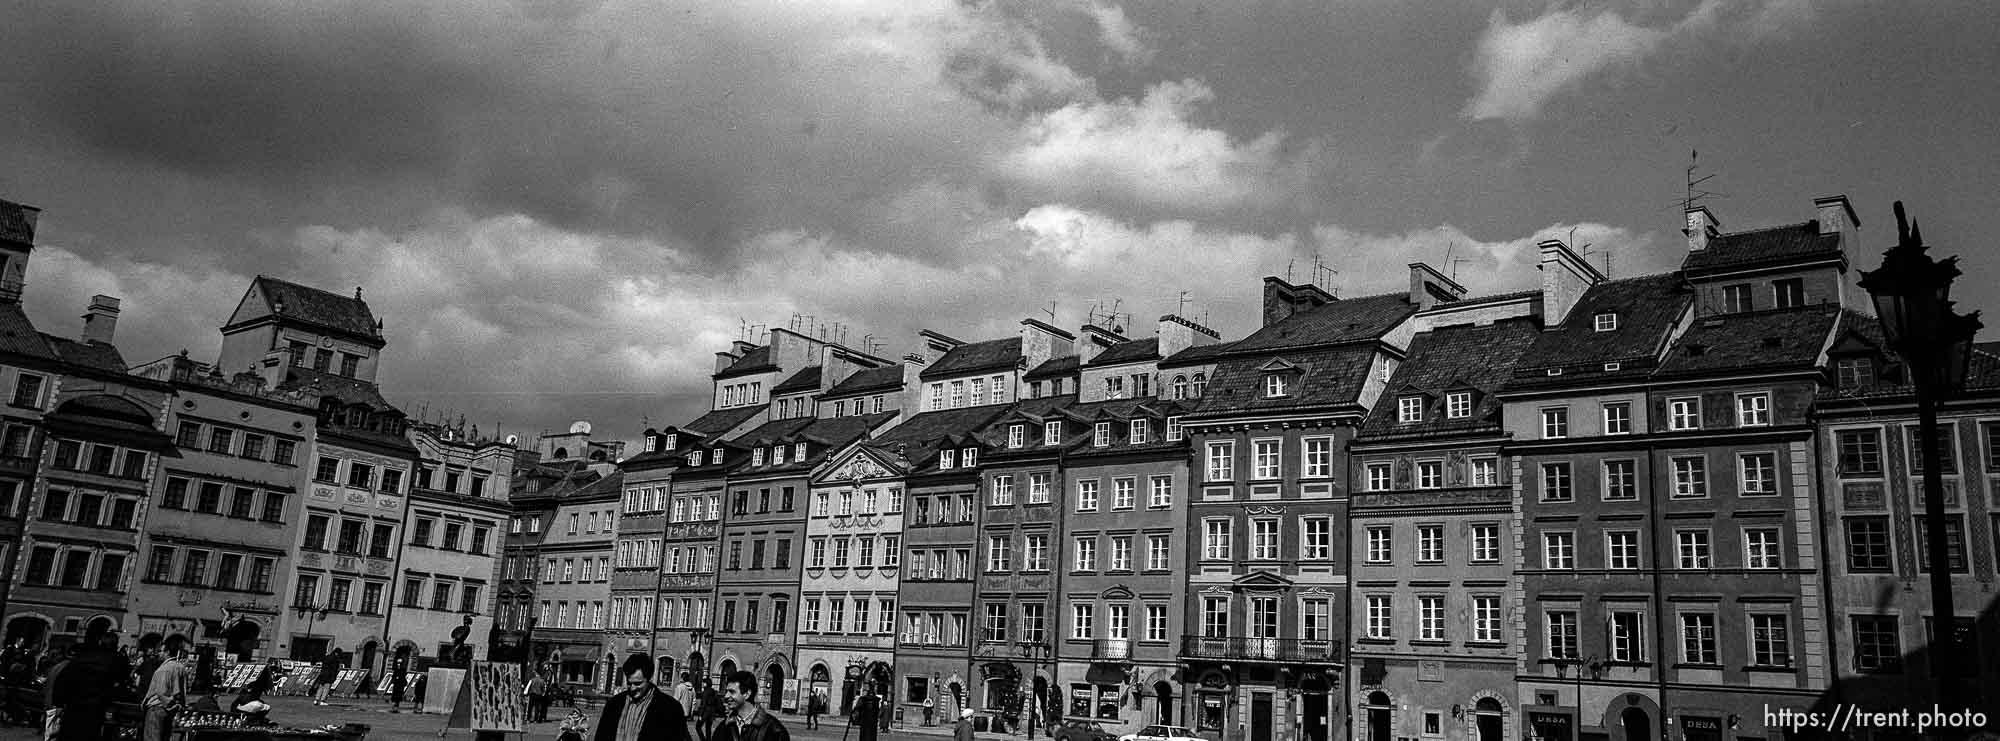 Old town market (rynek)